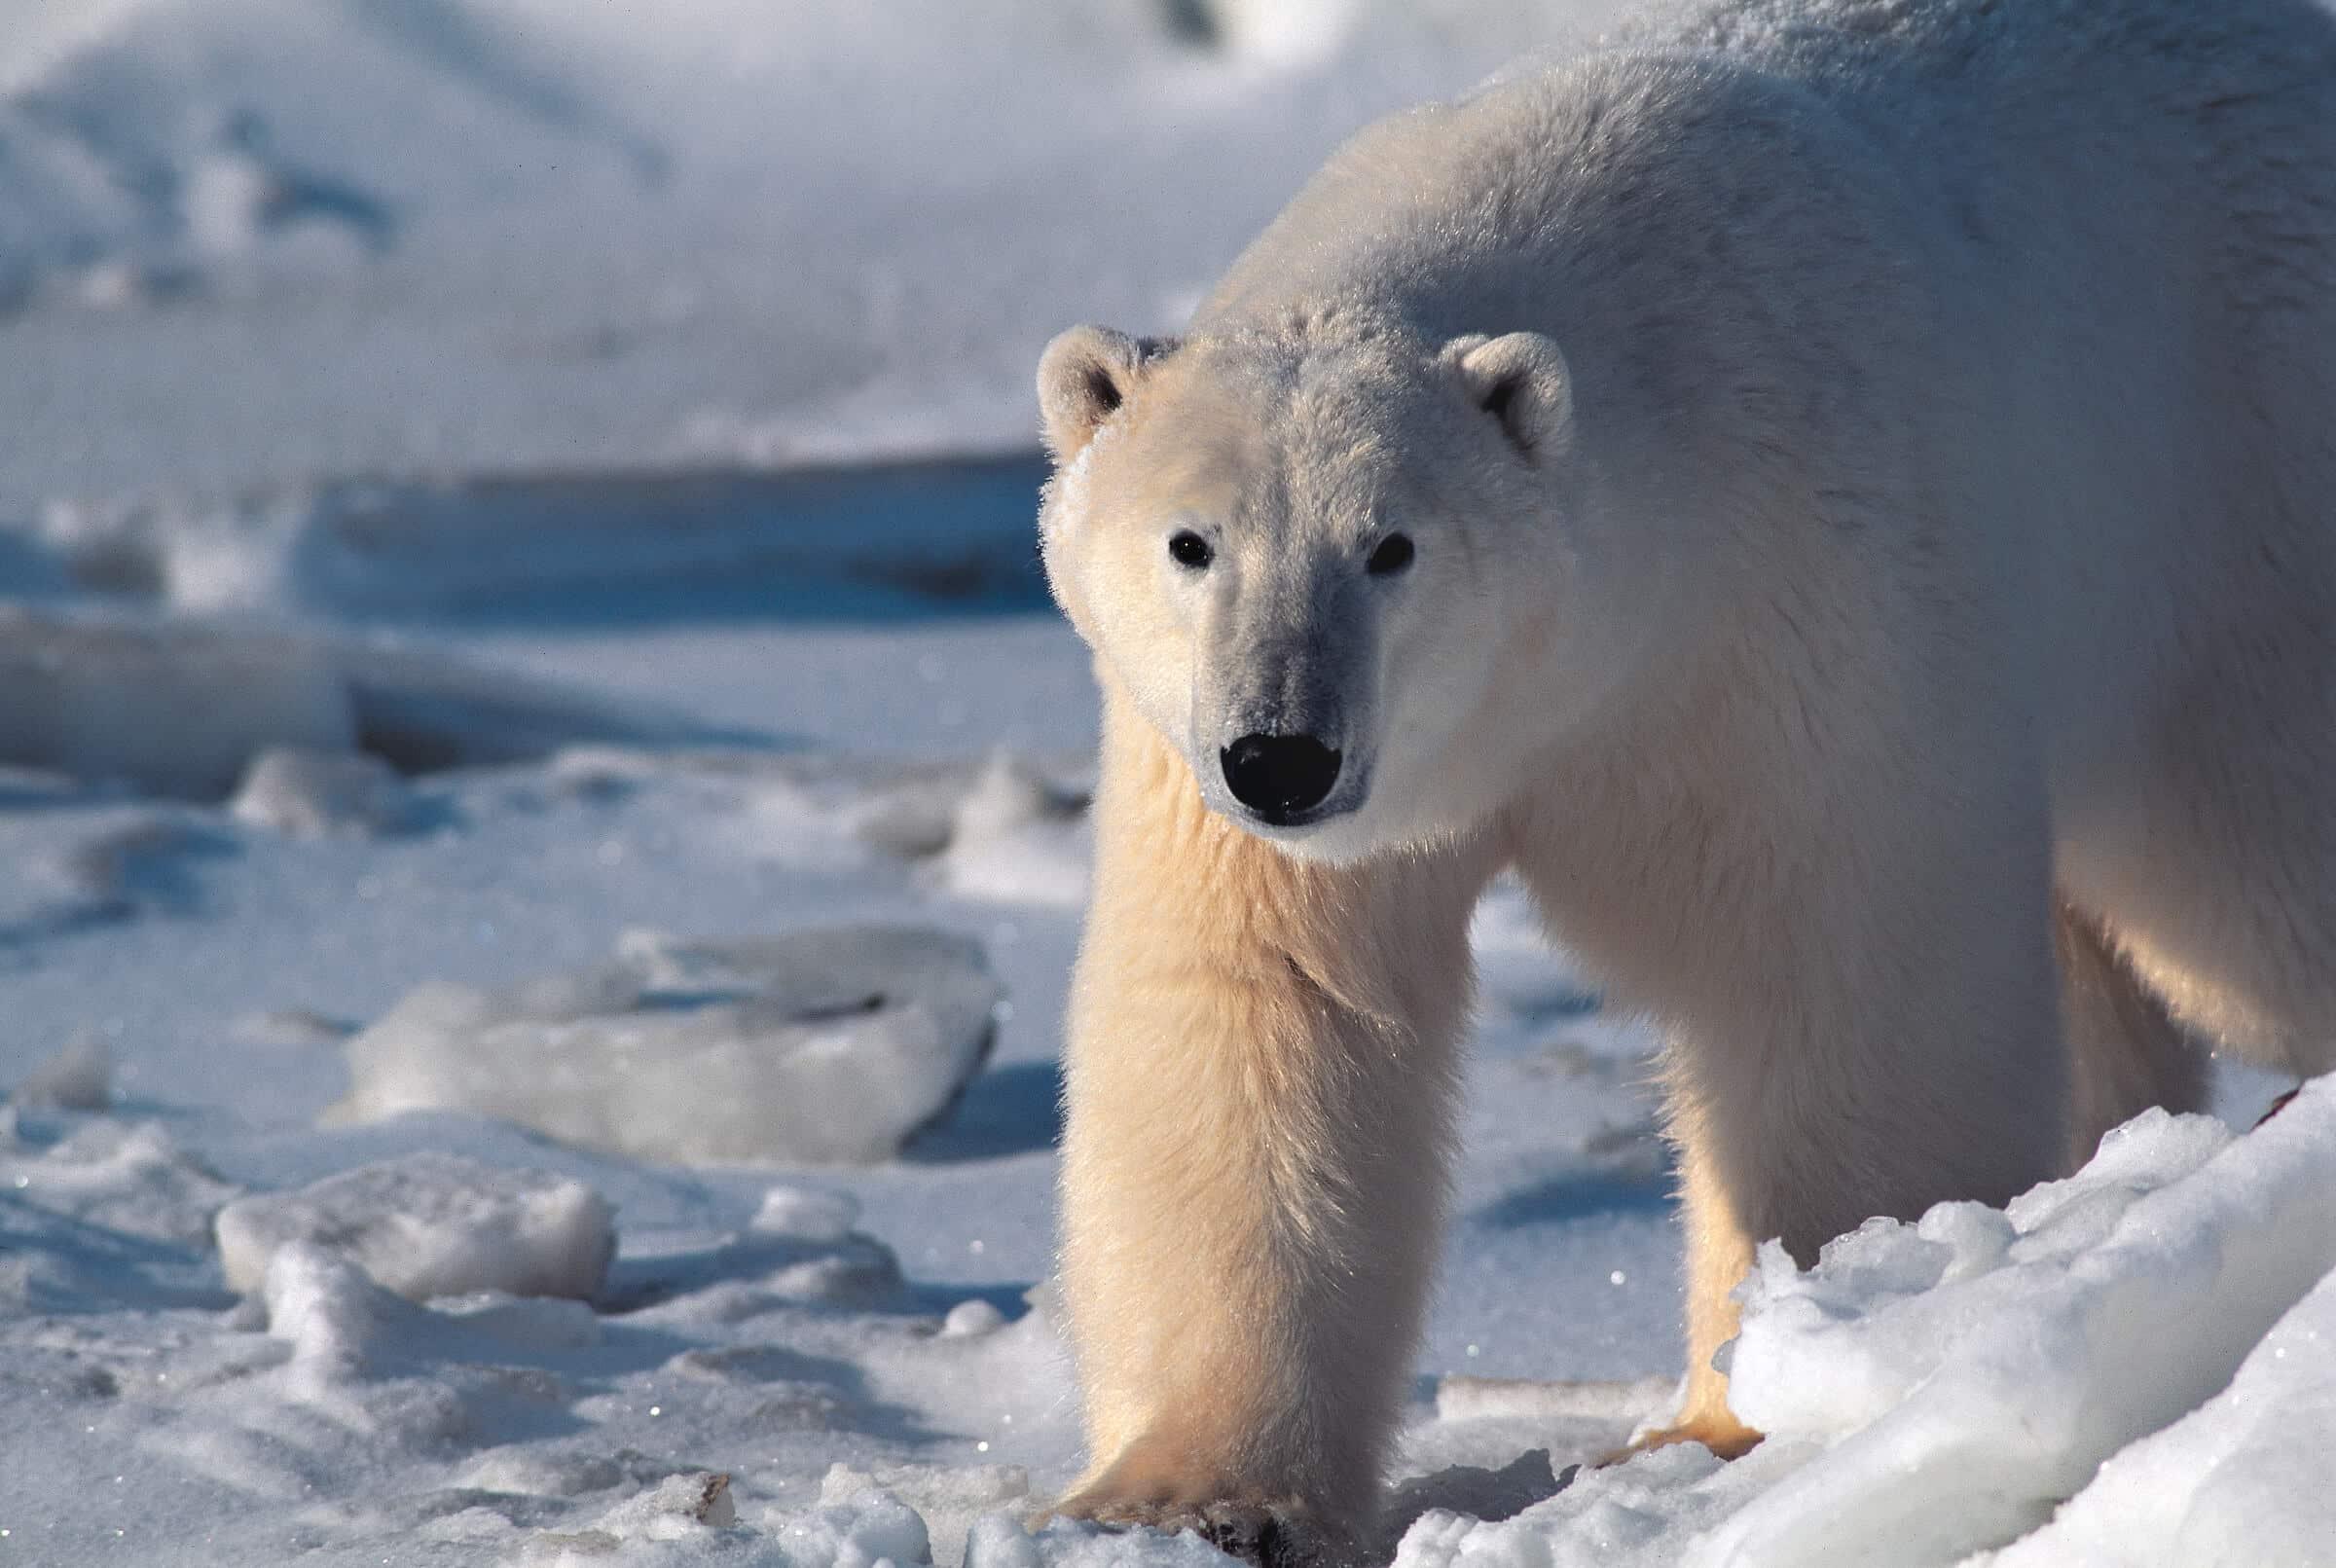 Polar bear walks on ice. Photo by Staffan Widstrand.